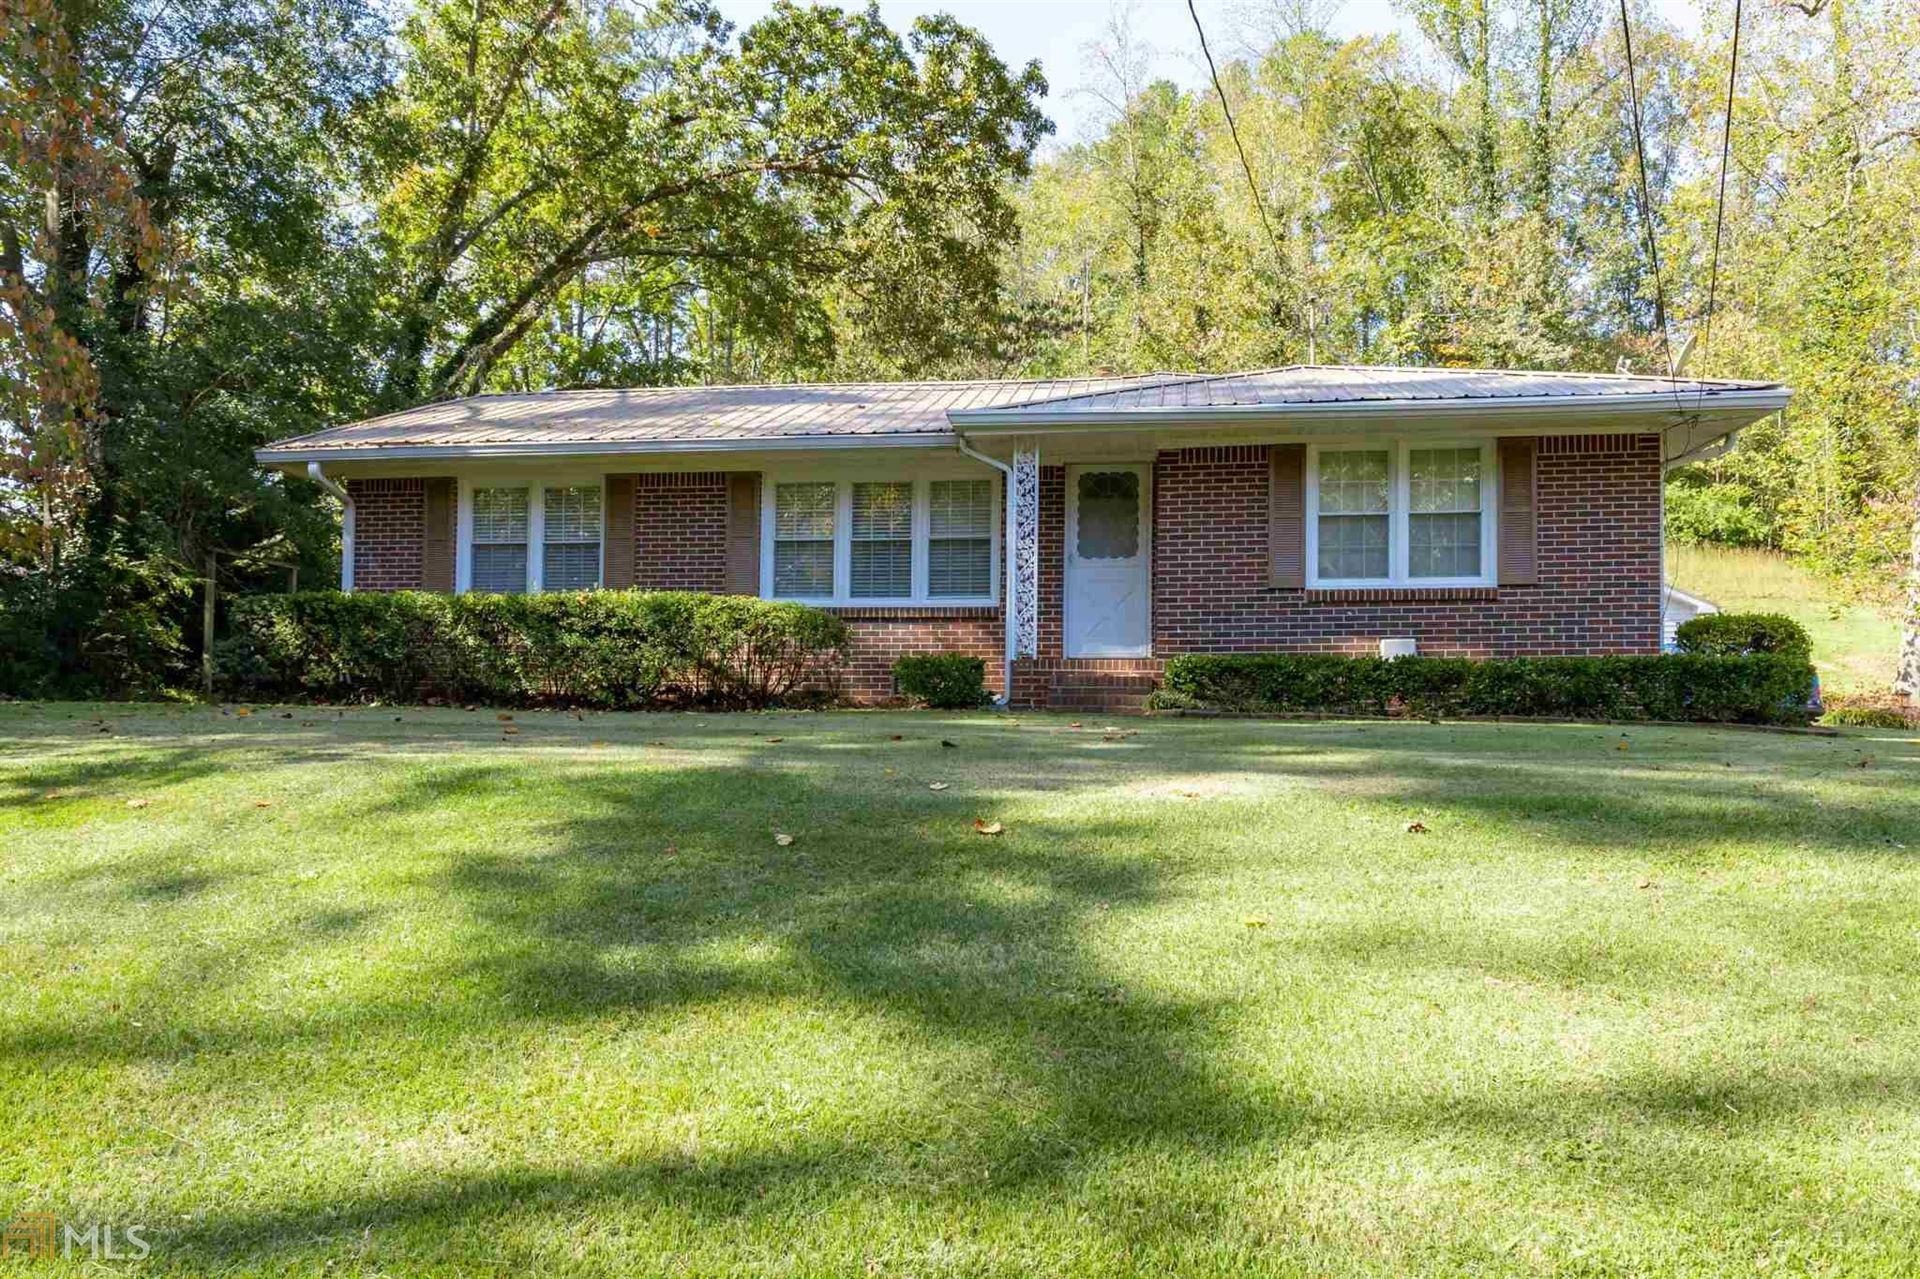 290 Old Acworth Rd, Dallas, GA 30132 - MLS#: 8880282